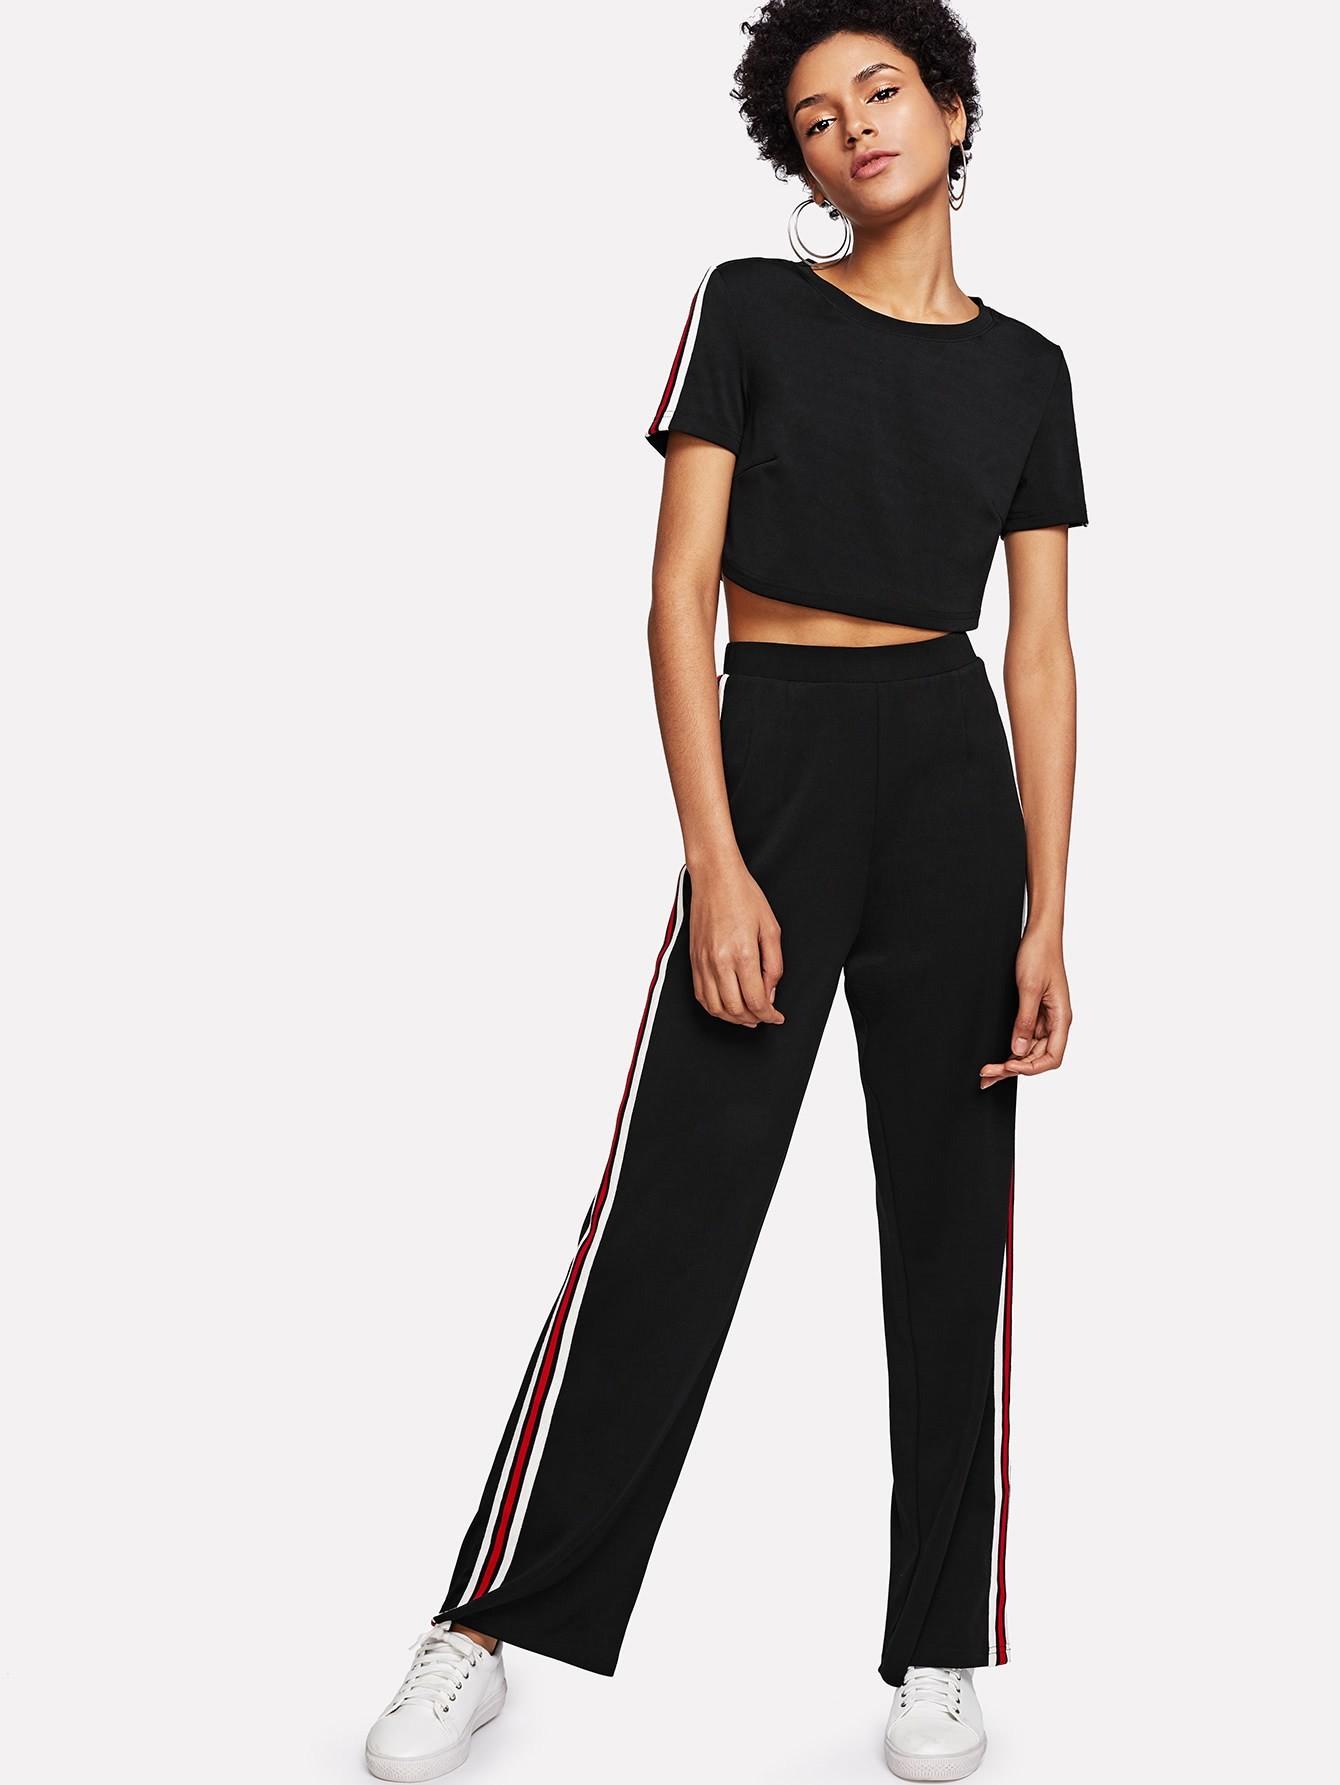 Striped Side Crop Top & Pants Set striped side crop top